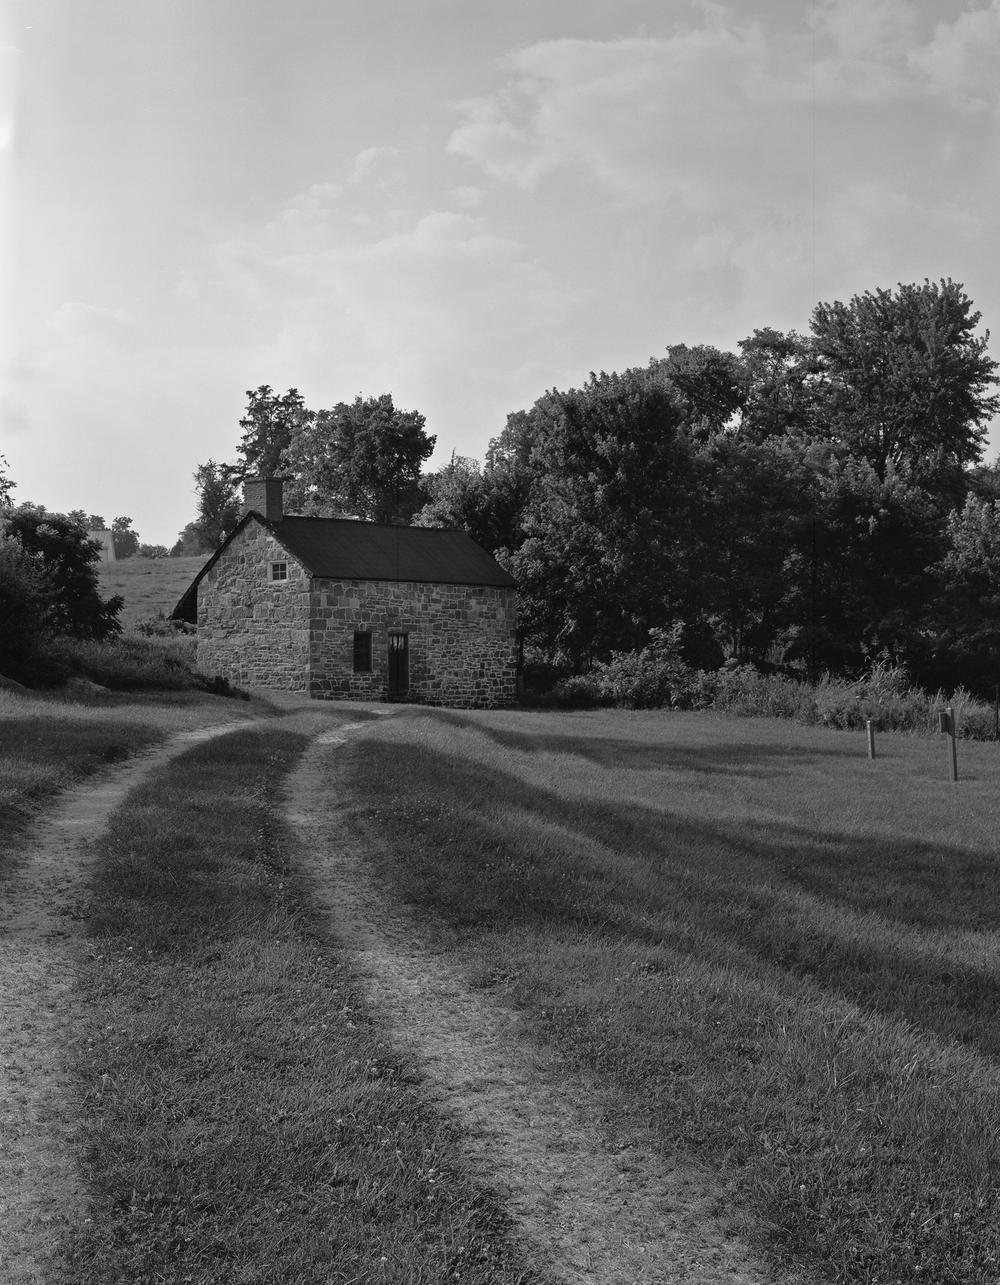 Roulette Farm at Antietam